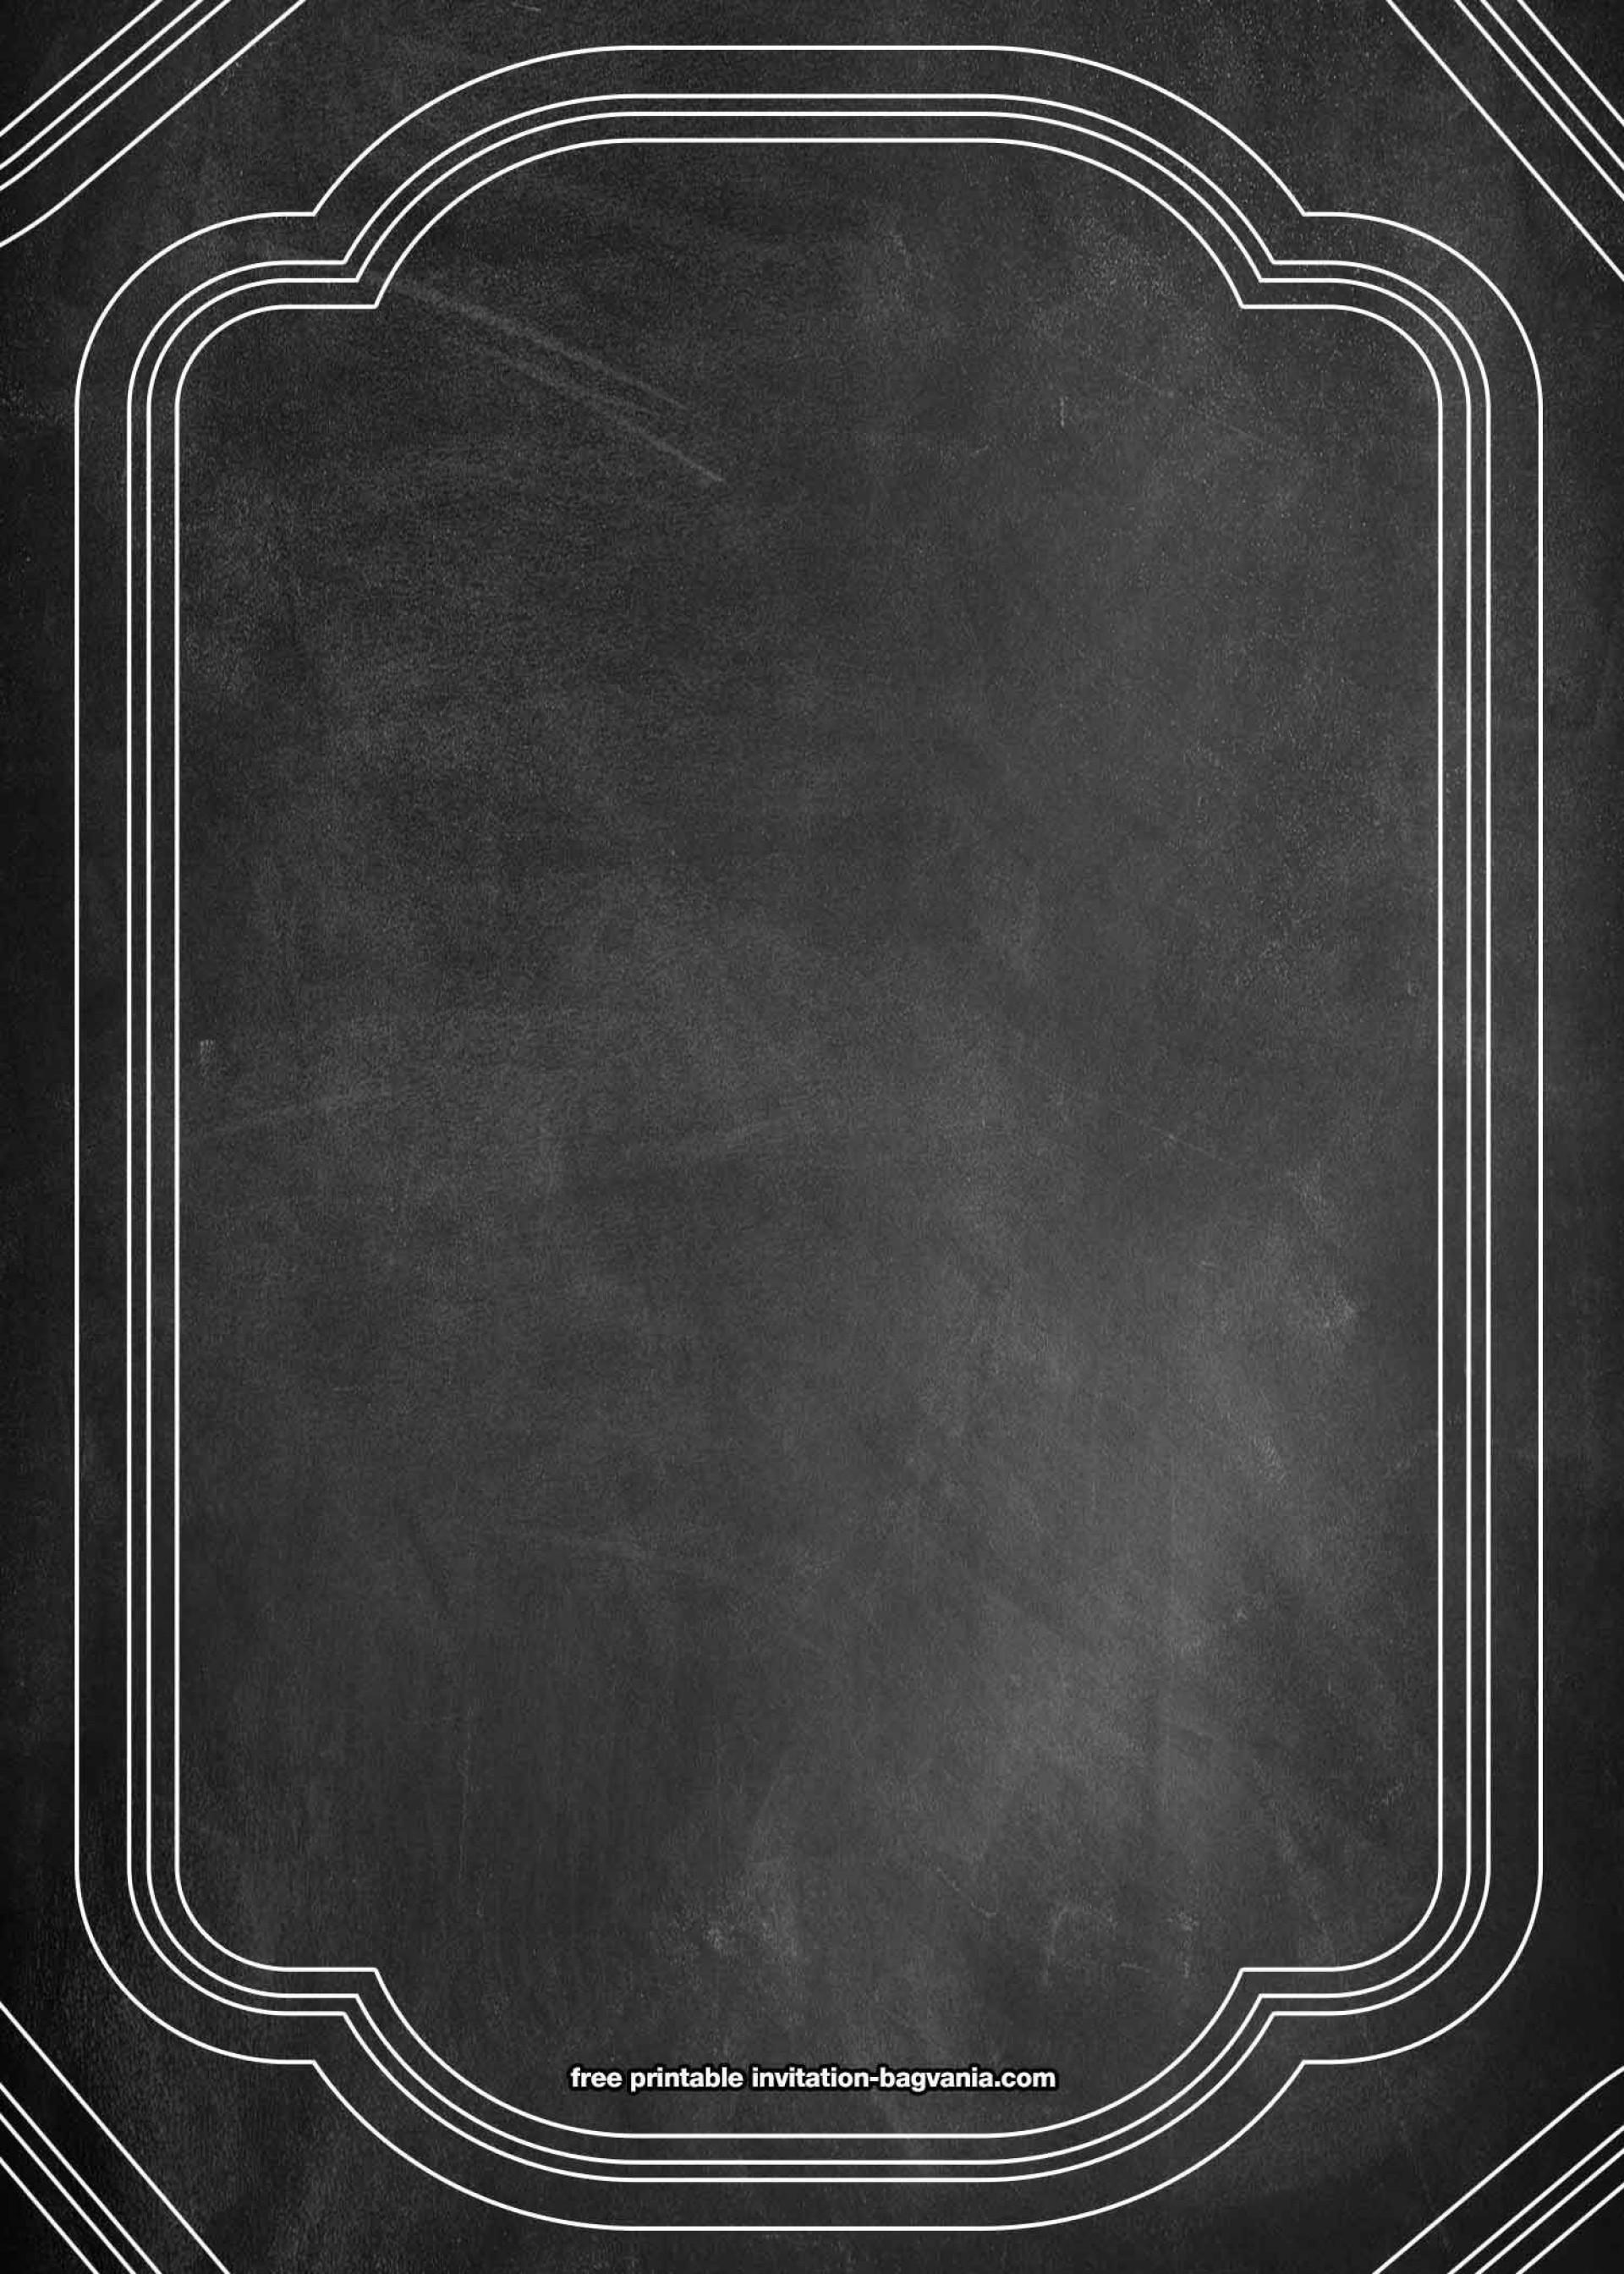 001 Stirring Chalkboard Invitation Template Free Idea  Download Wedding Editable1920